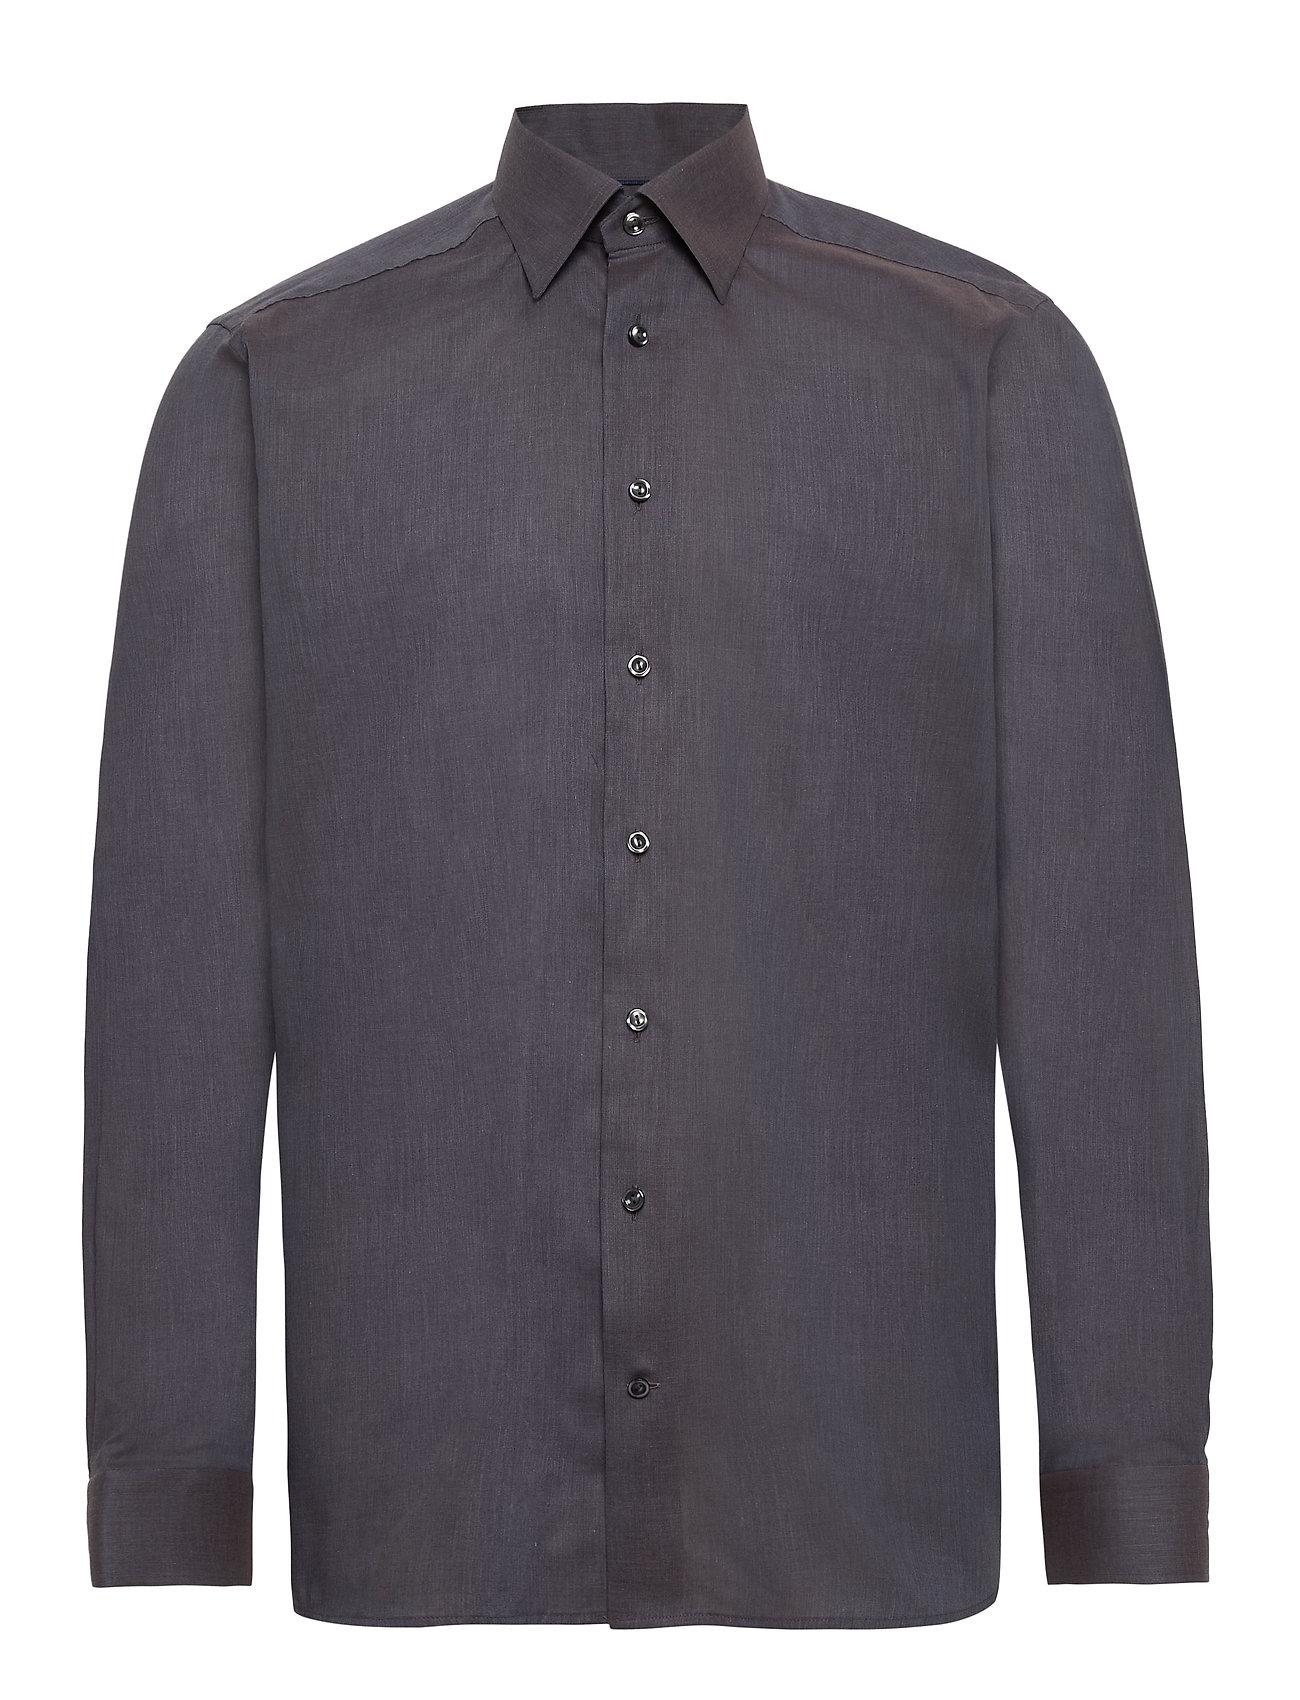 Eton Lightweight Flannel Shirt - Contemporary fit - GREY